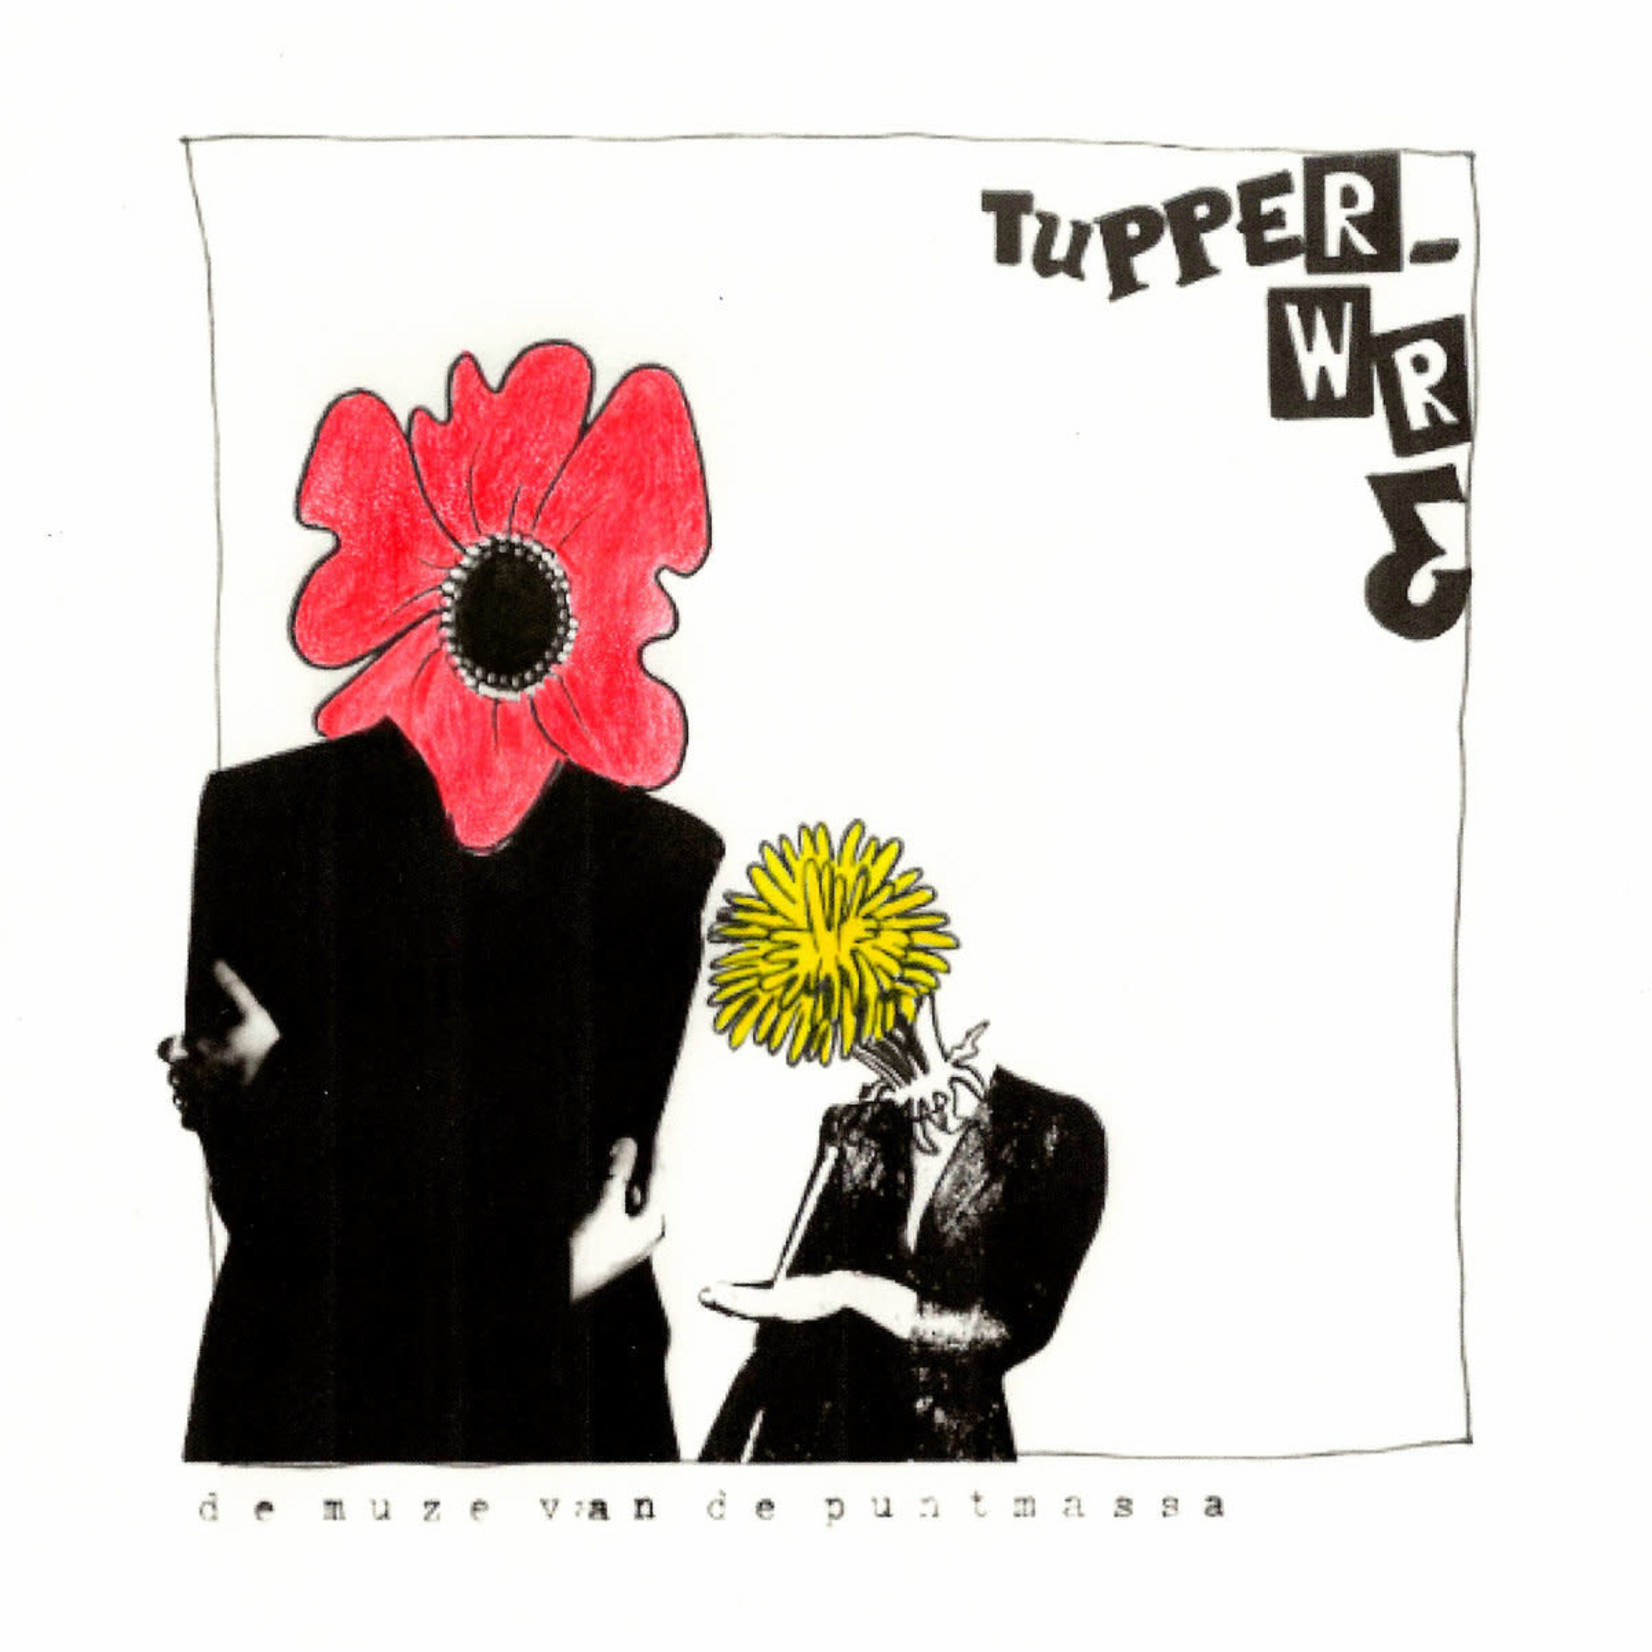 Tupperwr3 -  De Muze van de Puntmassa (VINYL)